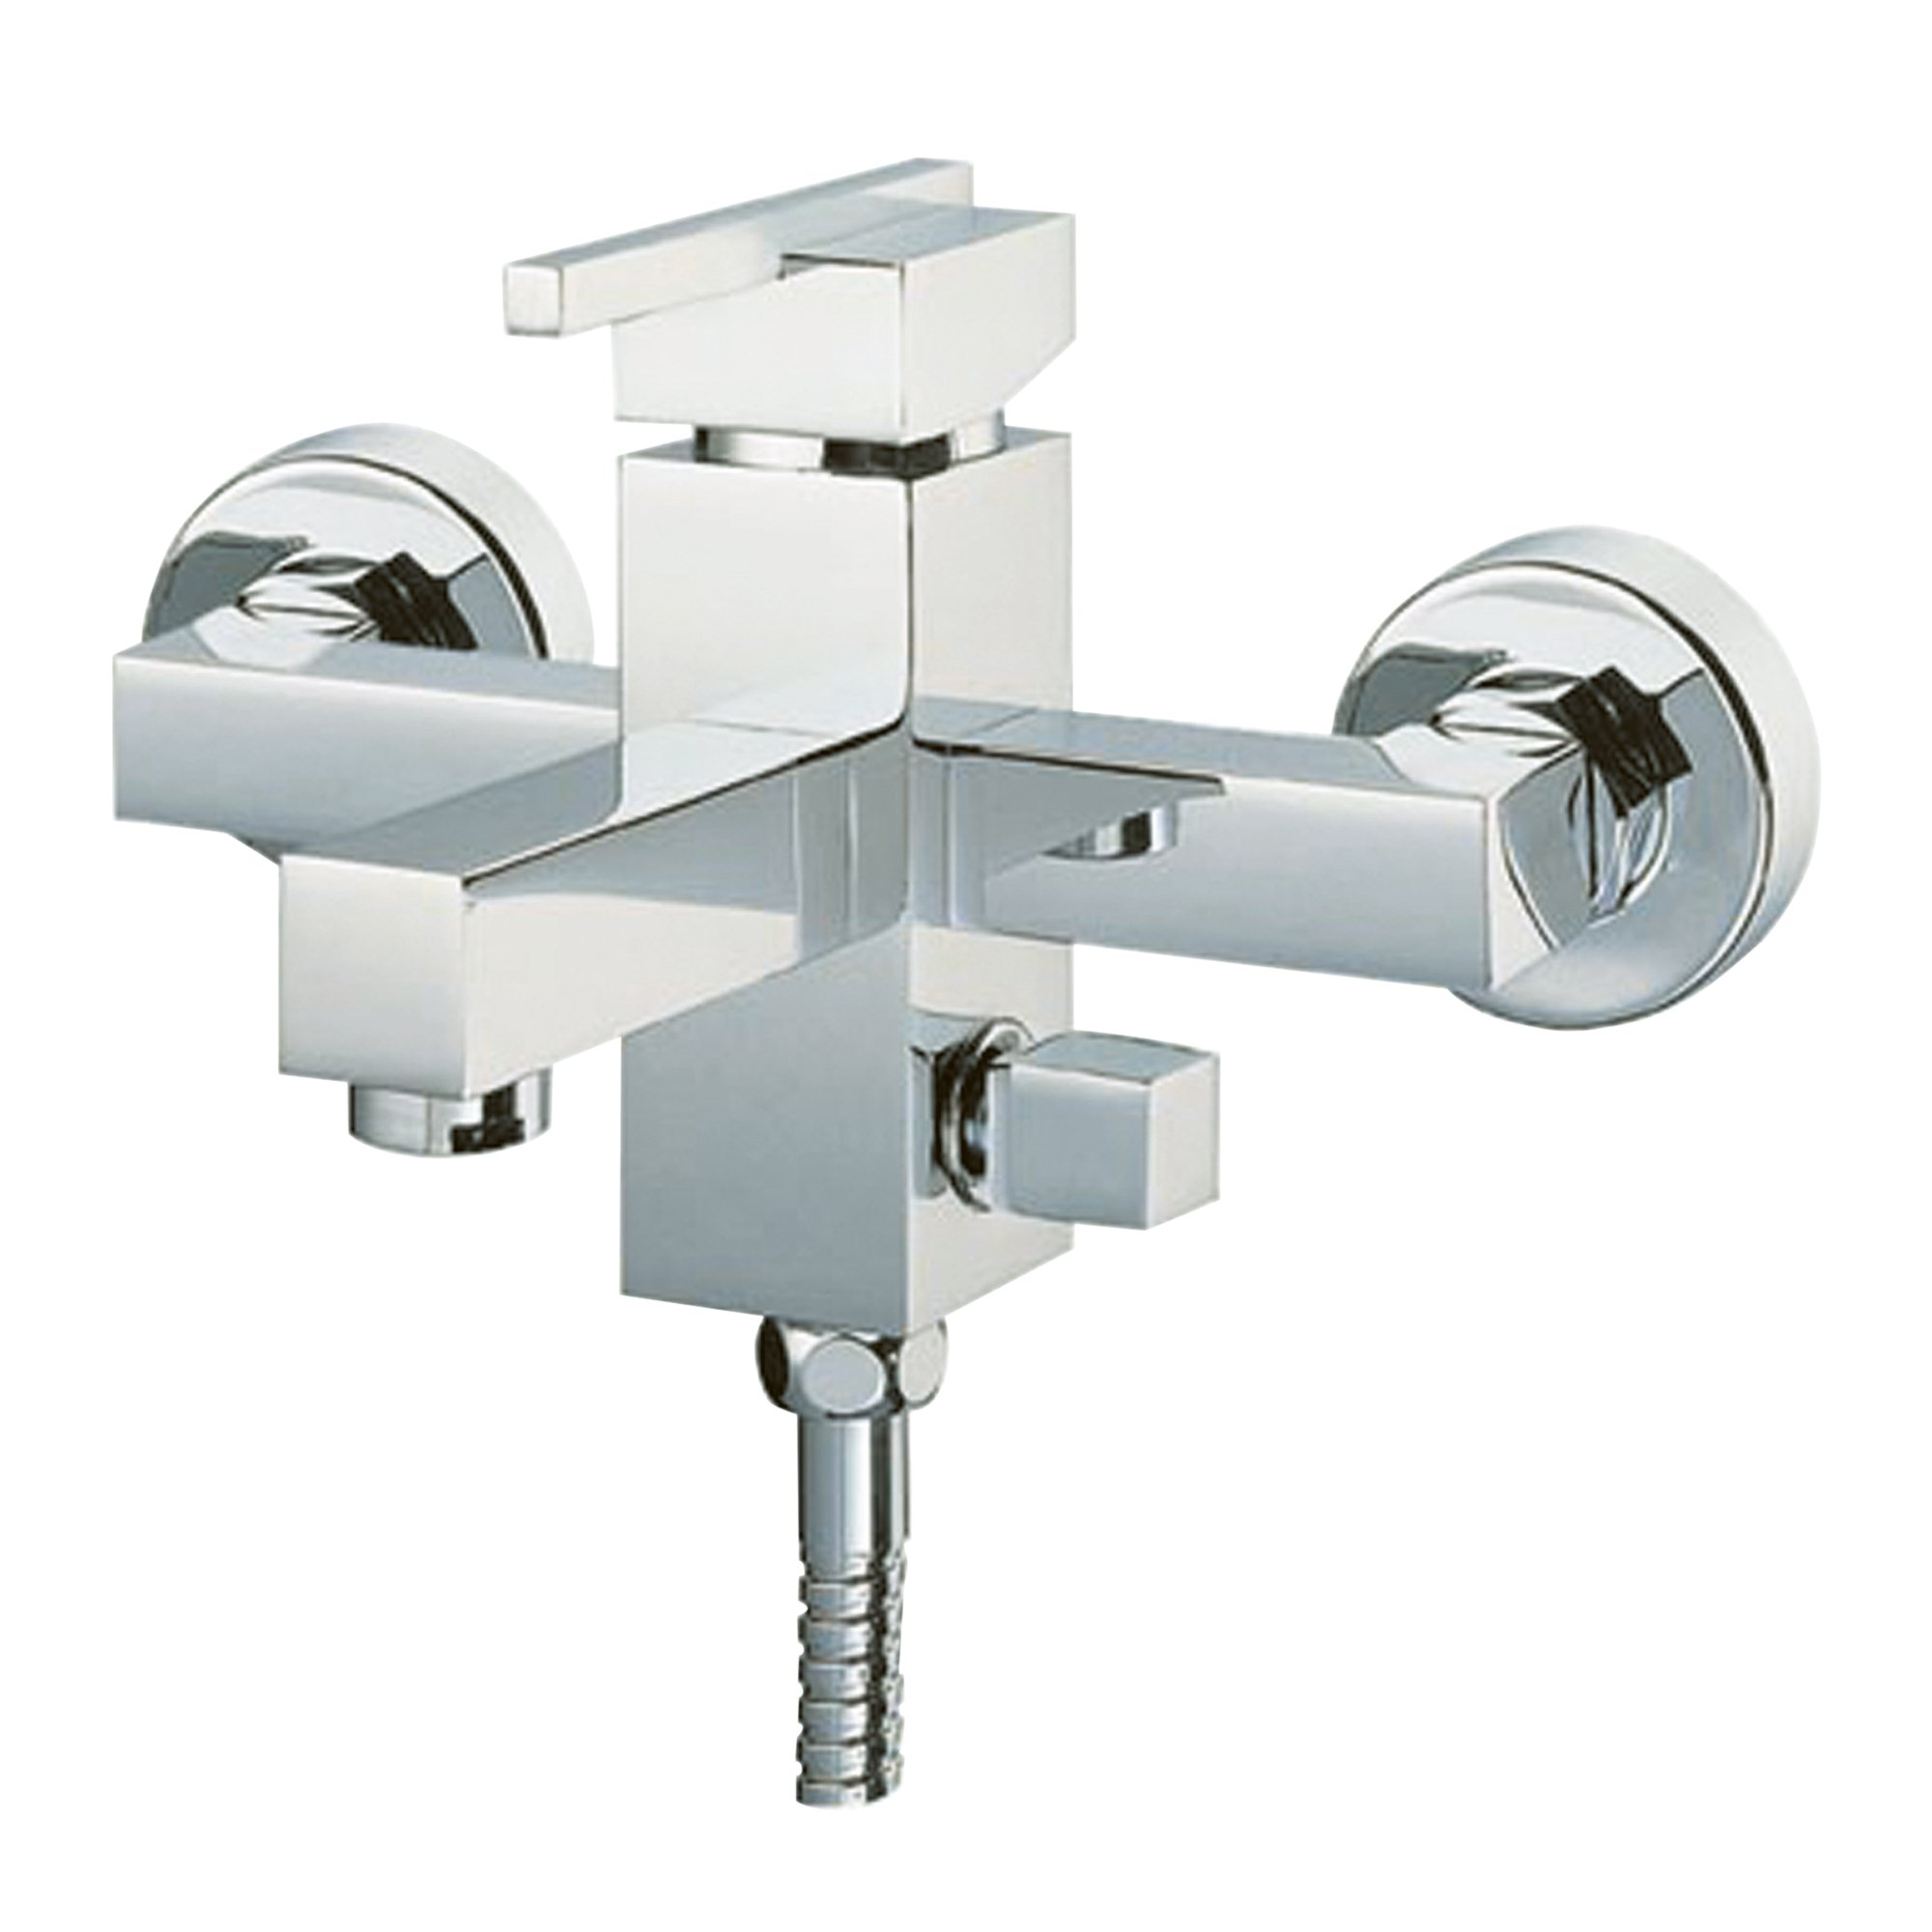 Idro Bric J46339 Laser Miscelatore Monocomando per Vasca, Cromato